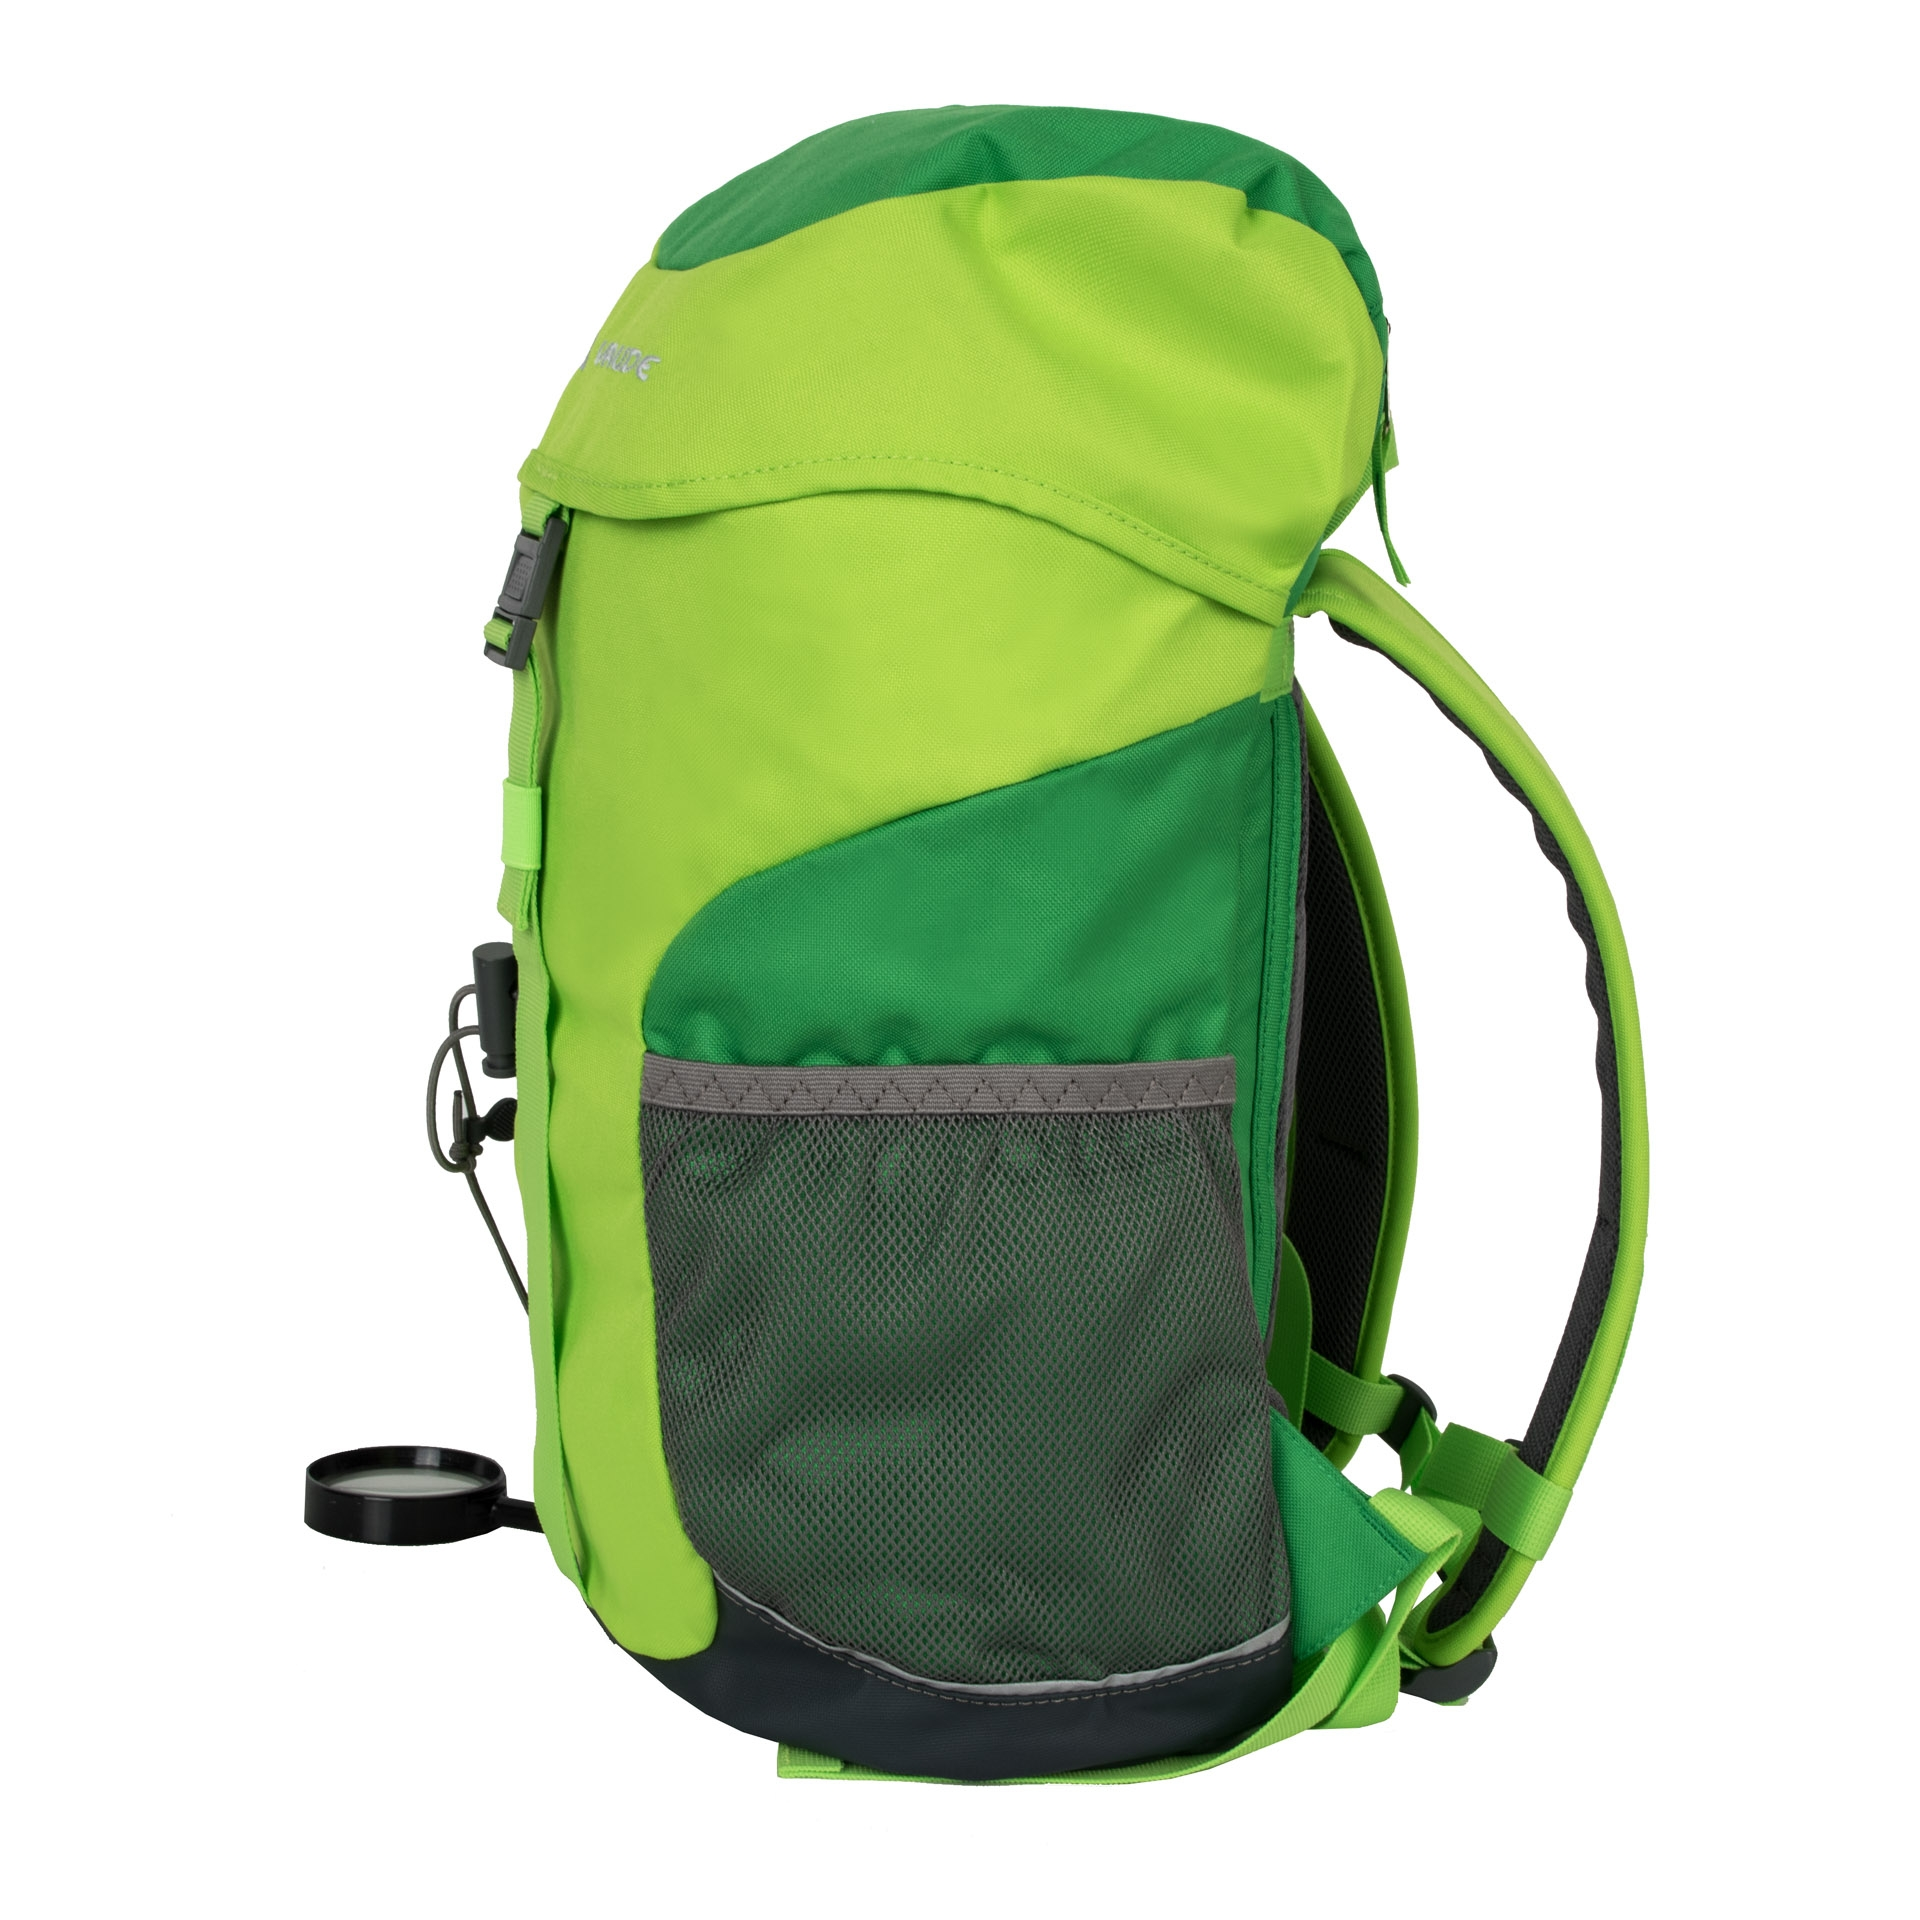 Vaude Puck 14 Grass/Applegreen Vaude Puck 14 je detský batoh vhodný pre cesty do prírody.